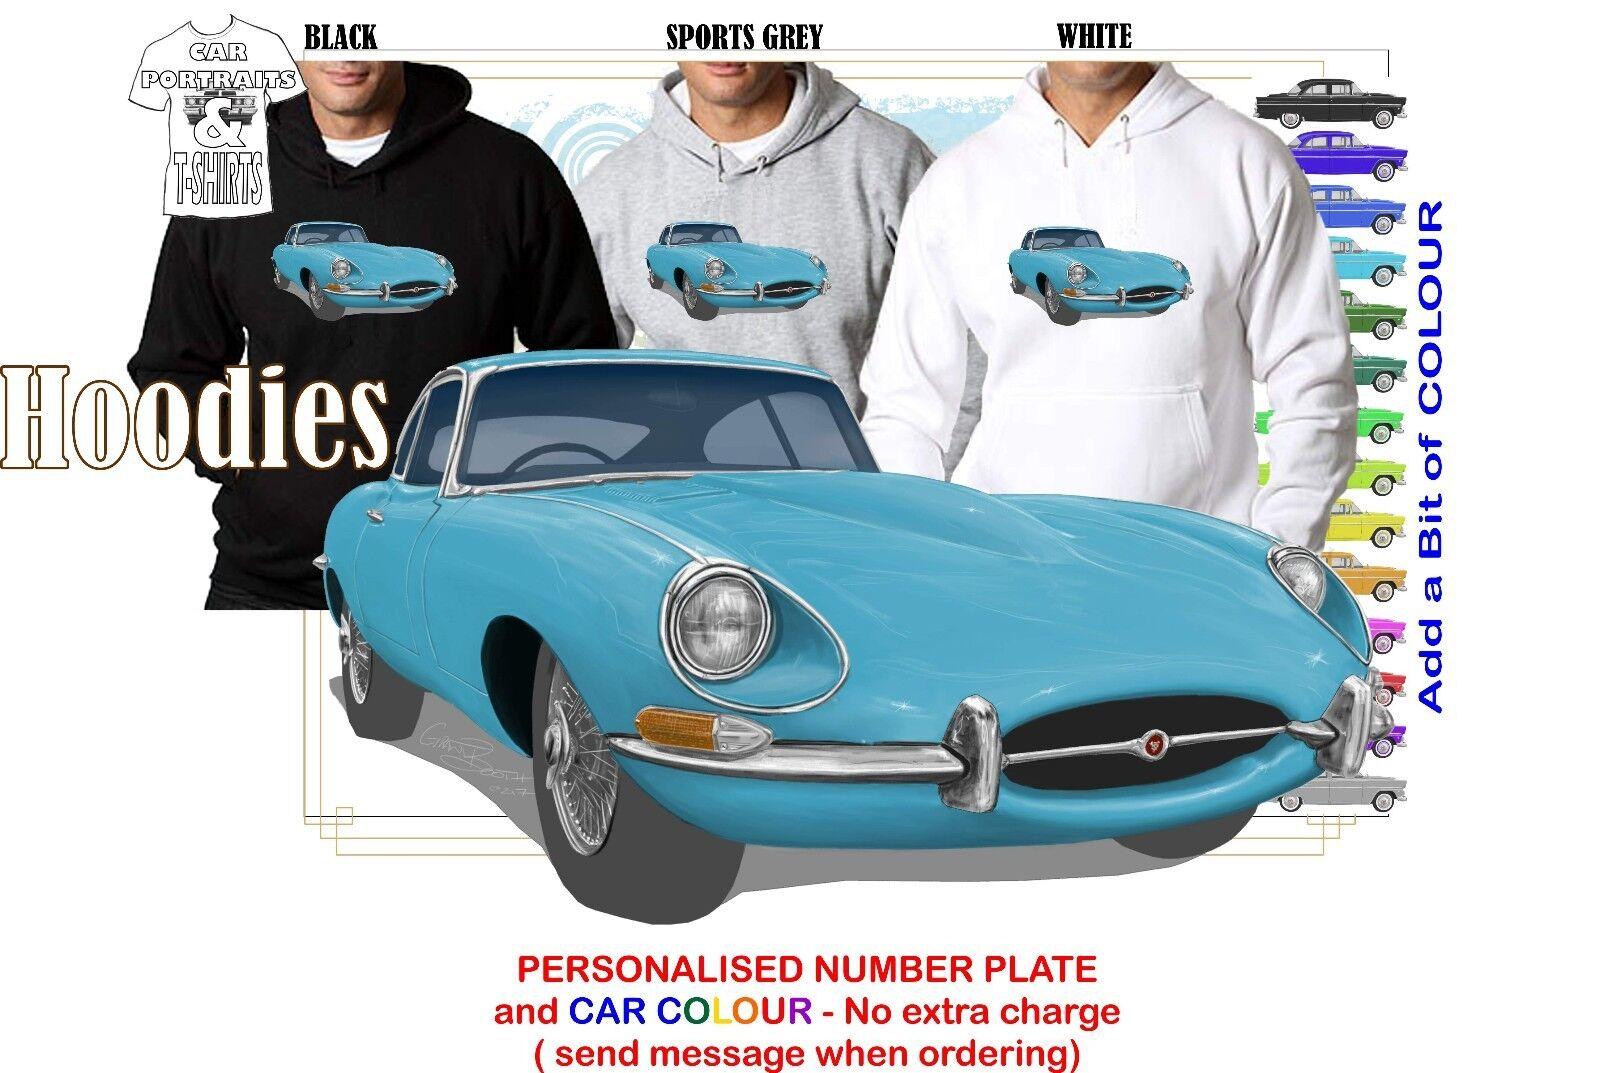 E-TYPE JAGUAR 1968 1.5 HFC HOODIE ILLUSTRATED CLASSIC RETRO MUSCLE SPORTS CAR